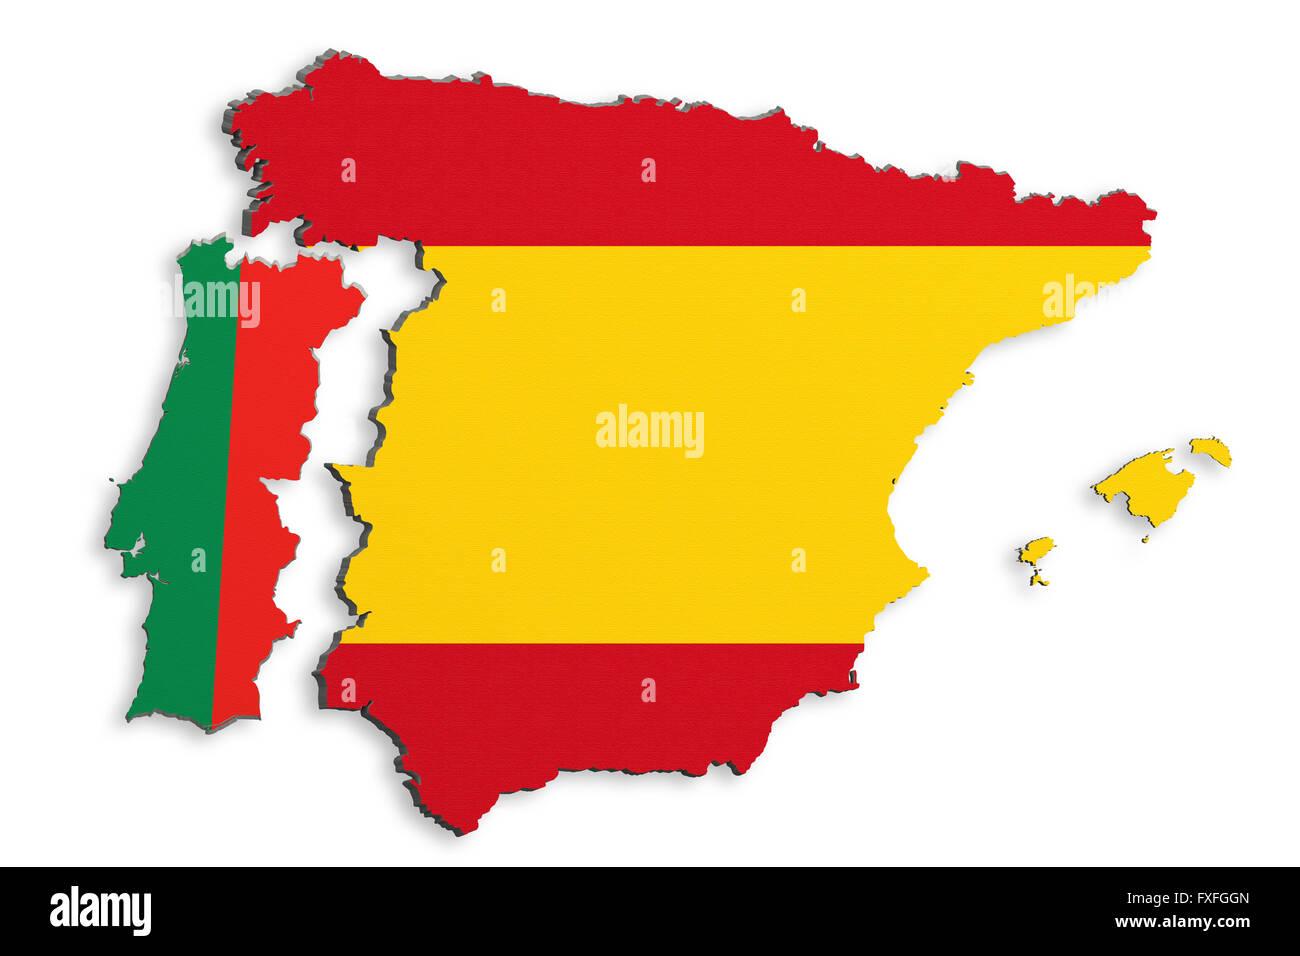 D Rendering Of Bright Colorful Iberian Peninsula Map Isolated In - Portugal map iberian peninsula